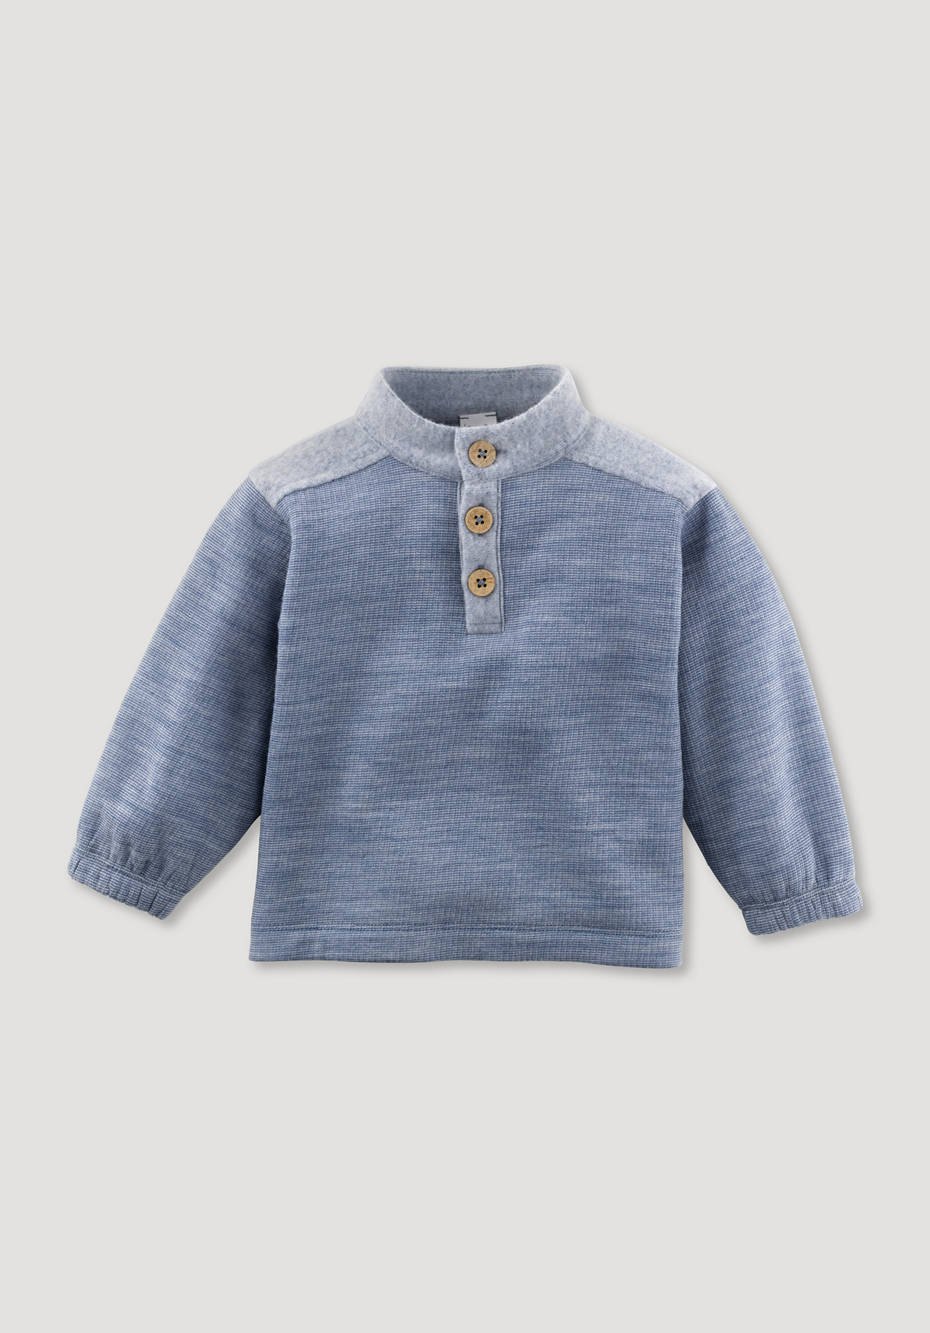 Wool fleece troyer made from pure organic merino wool